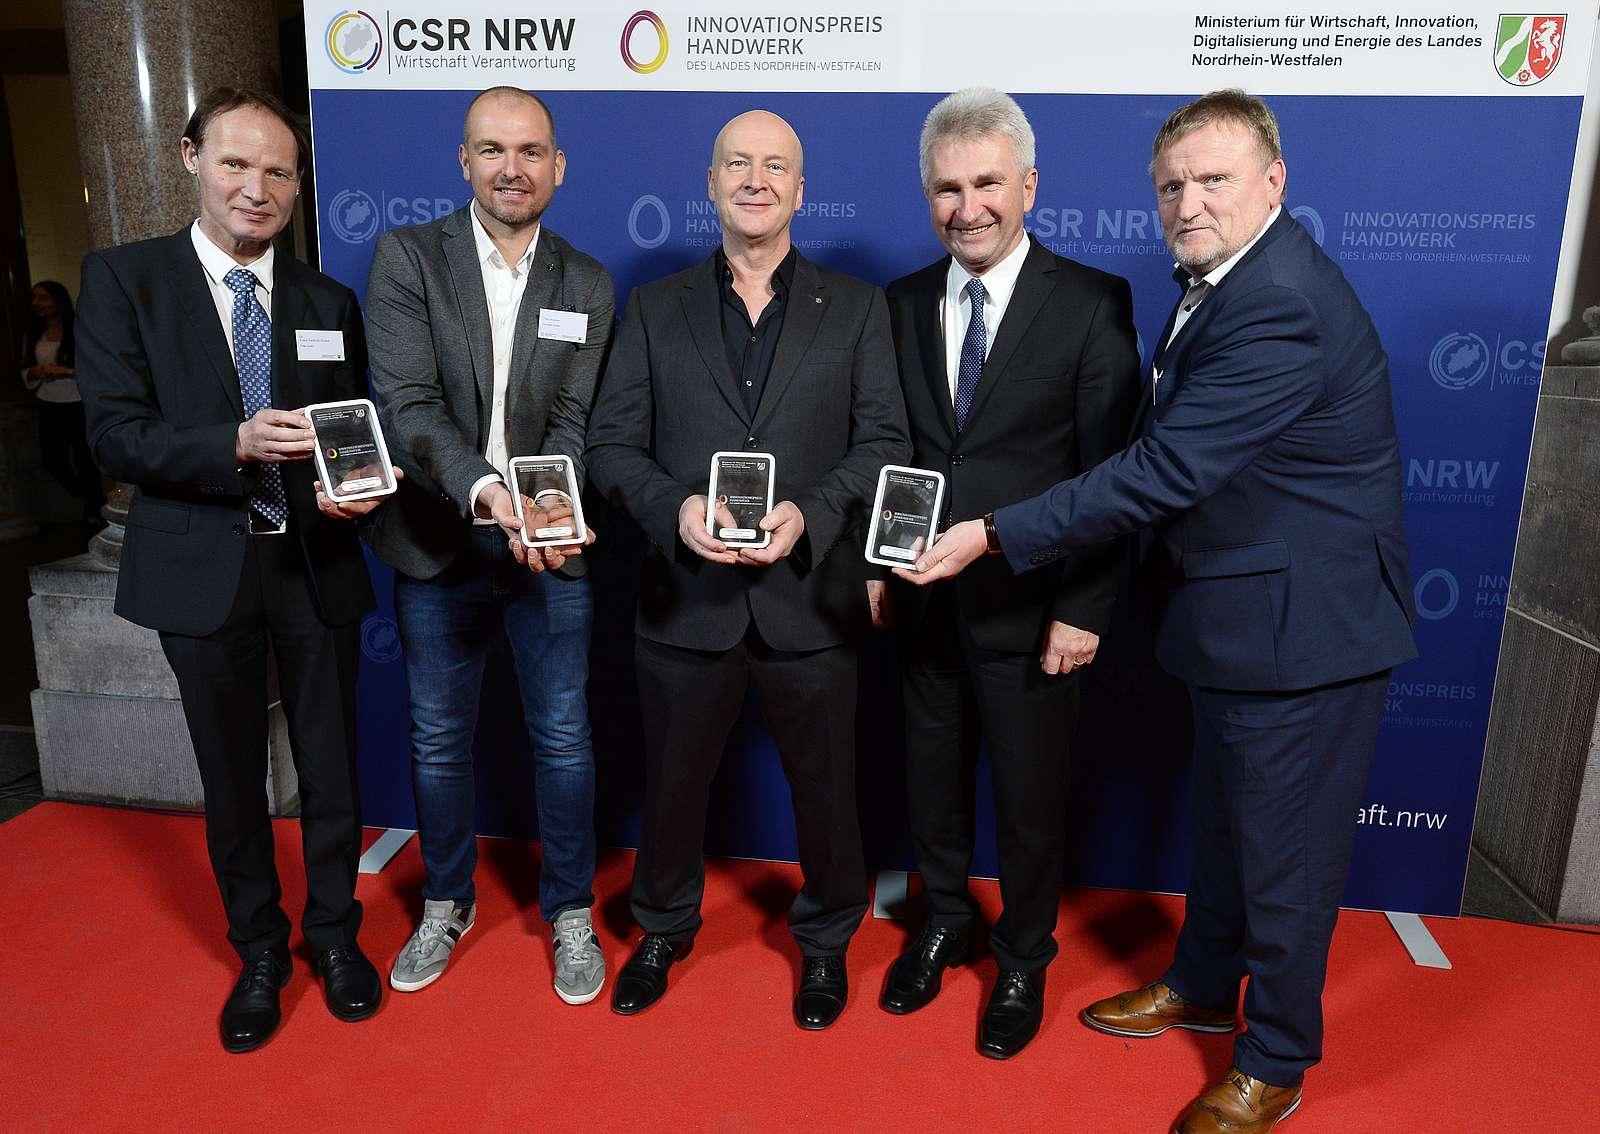 Innovationspreis 2019 die Preisträger